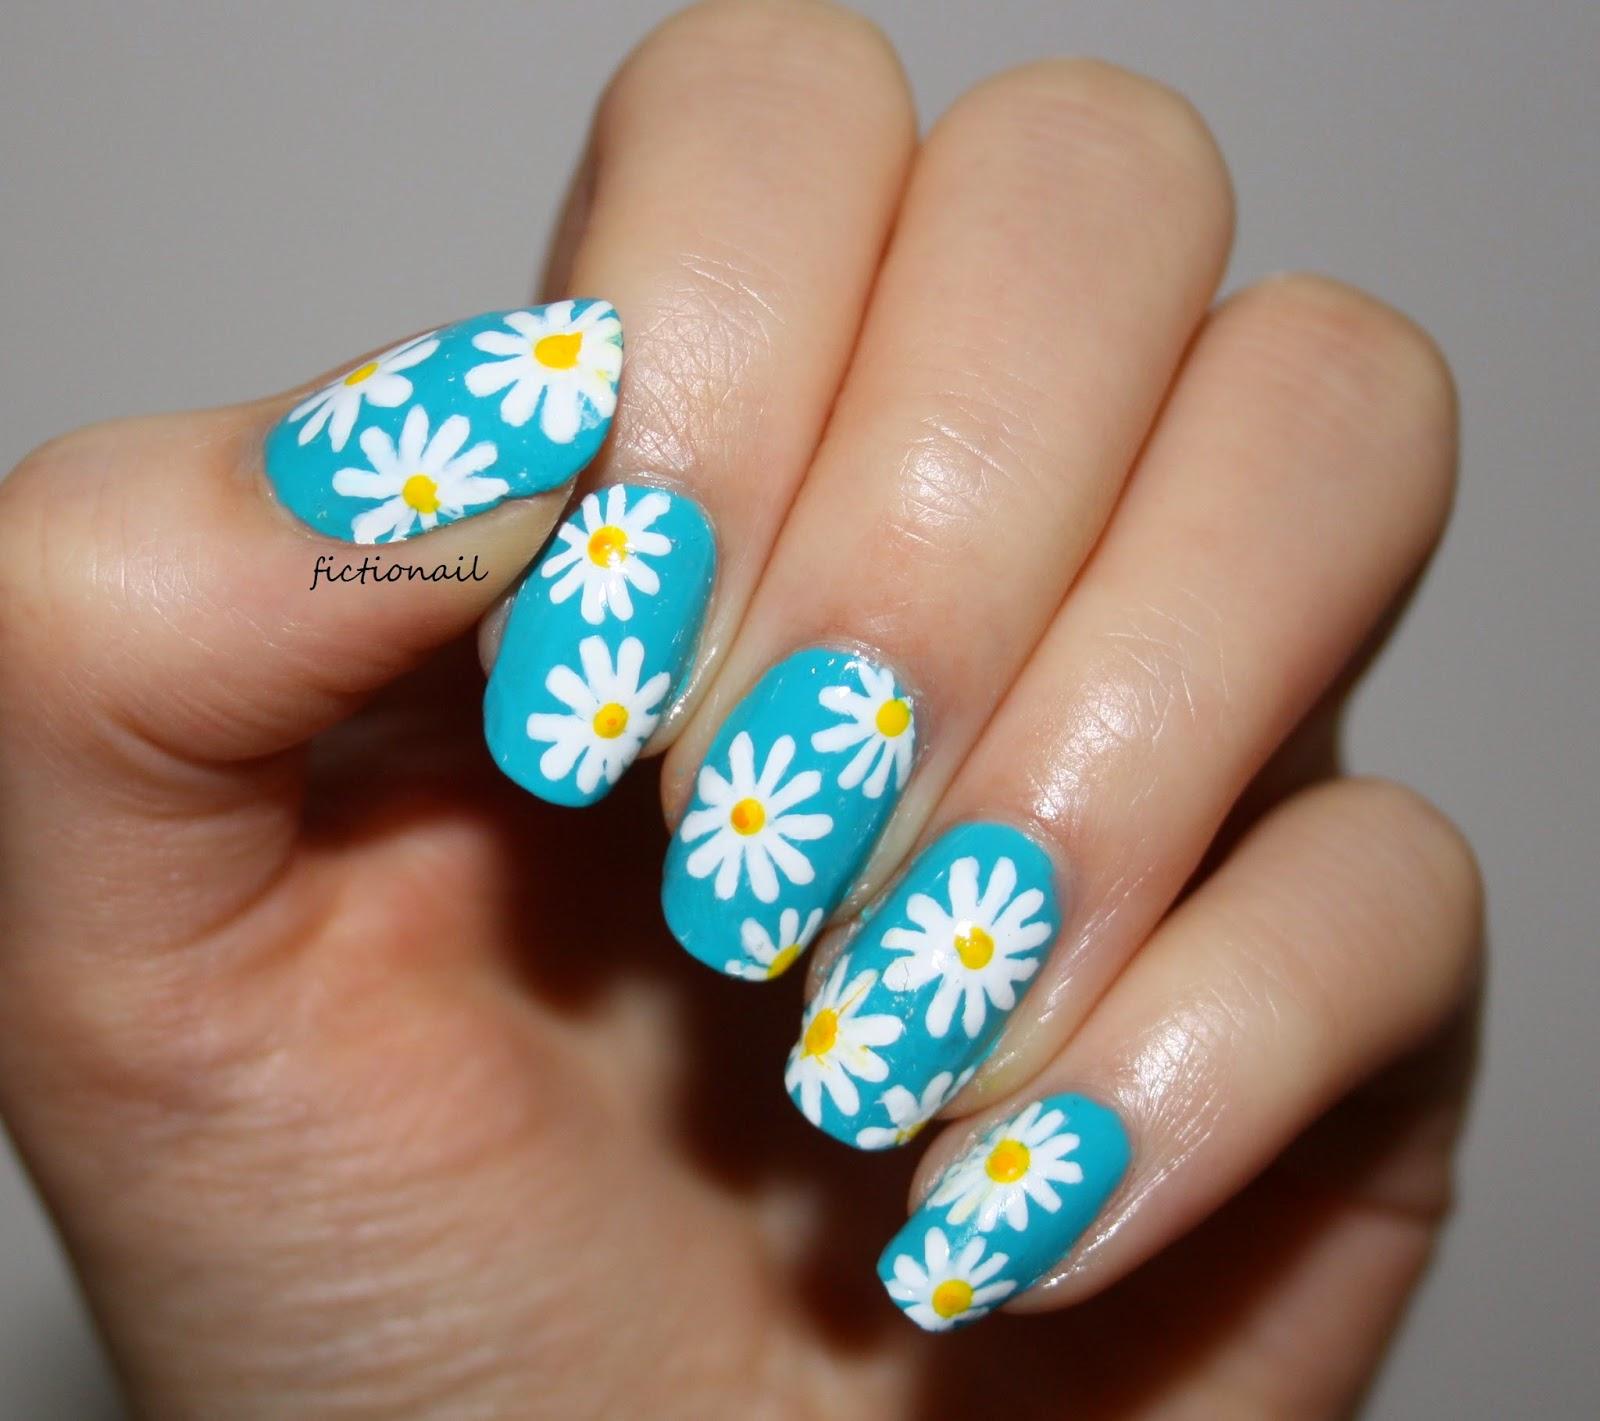 Nail Art: Daisy Nail